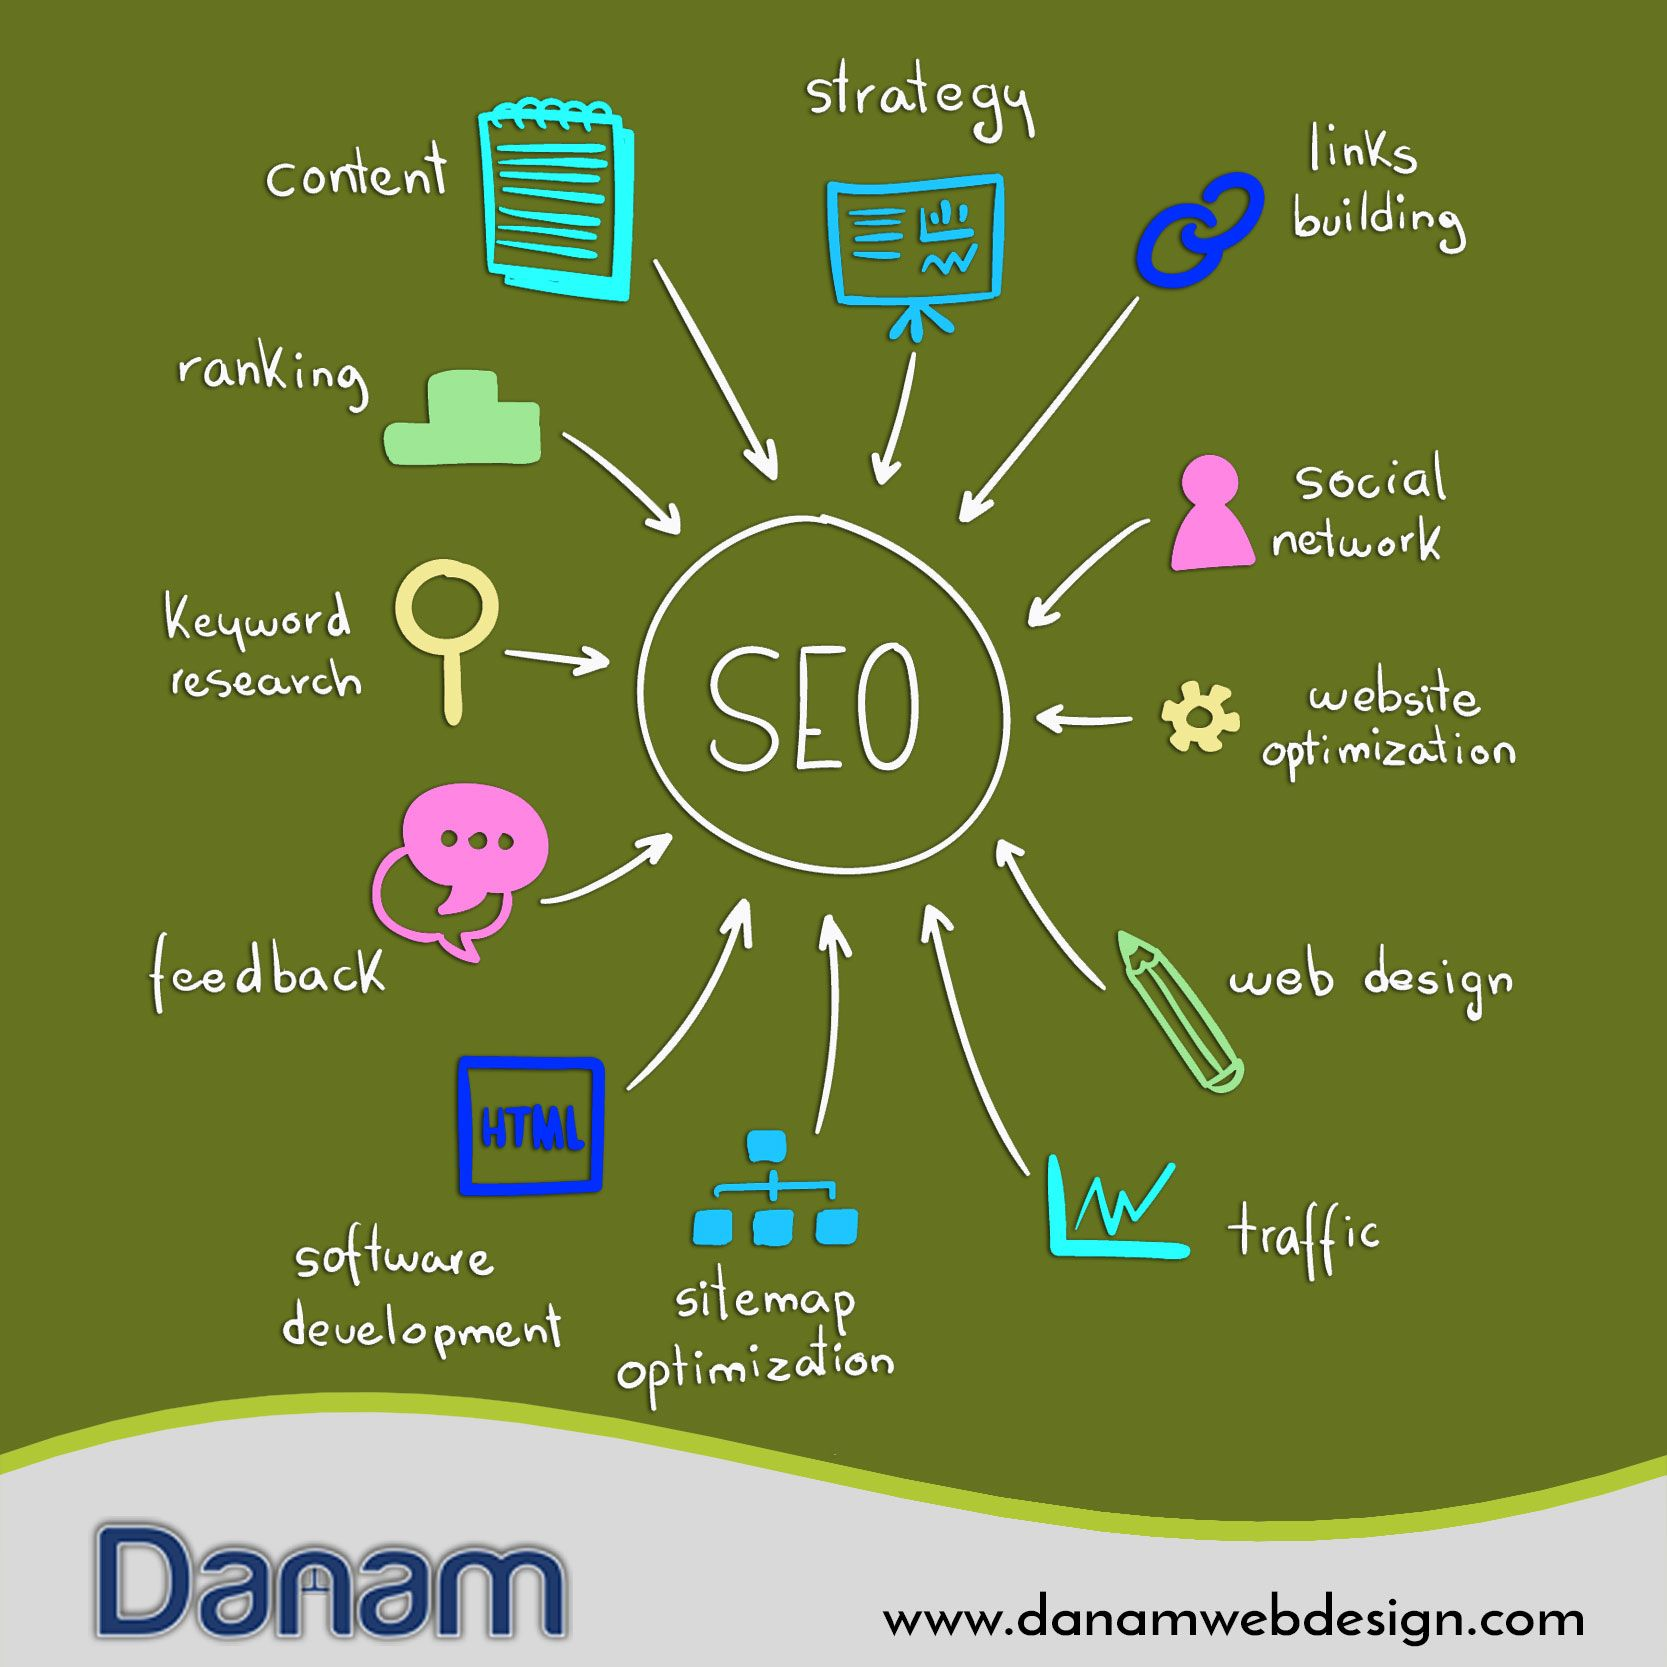 Pin By Danam Web Design Inc On Website Designing In Essex Web Design Packages Website Optimization Web Design